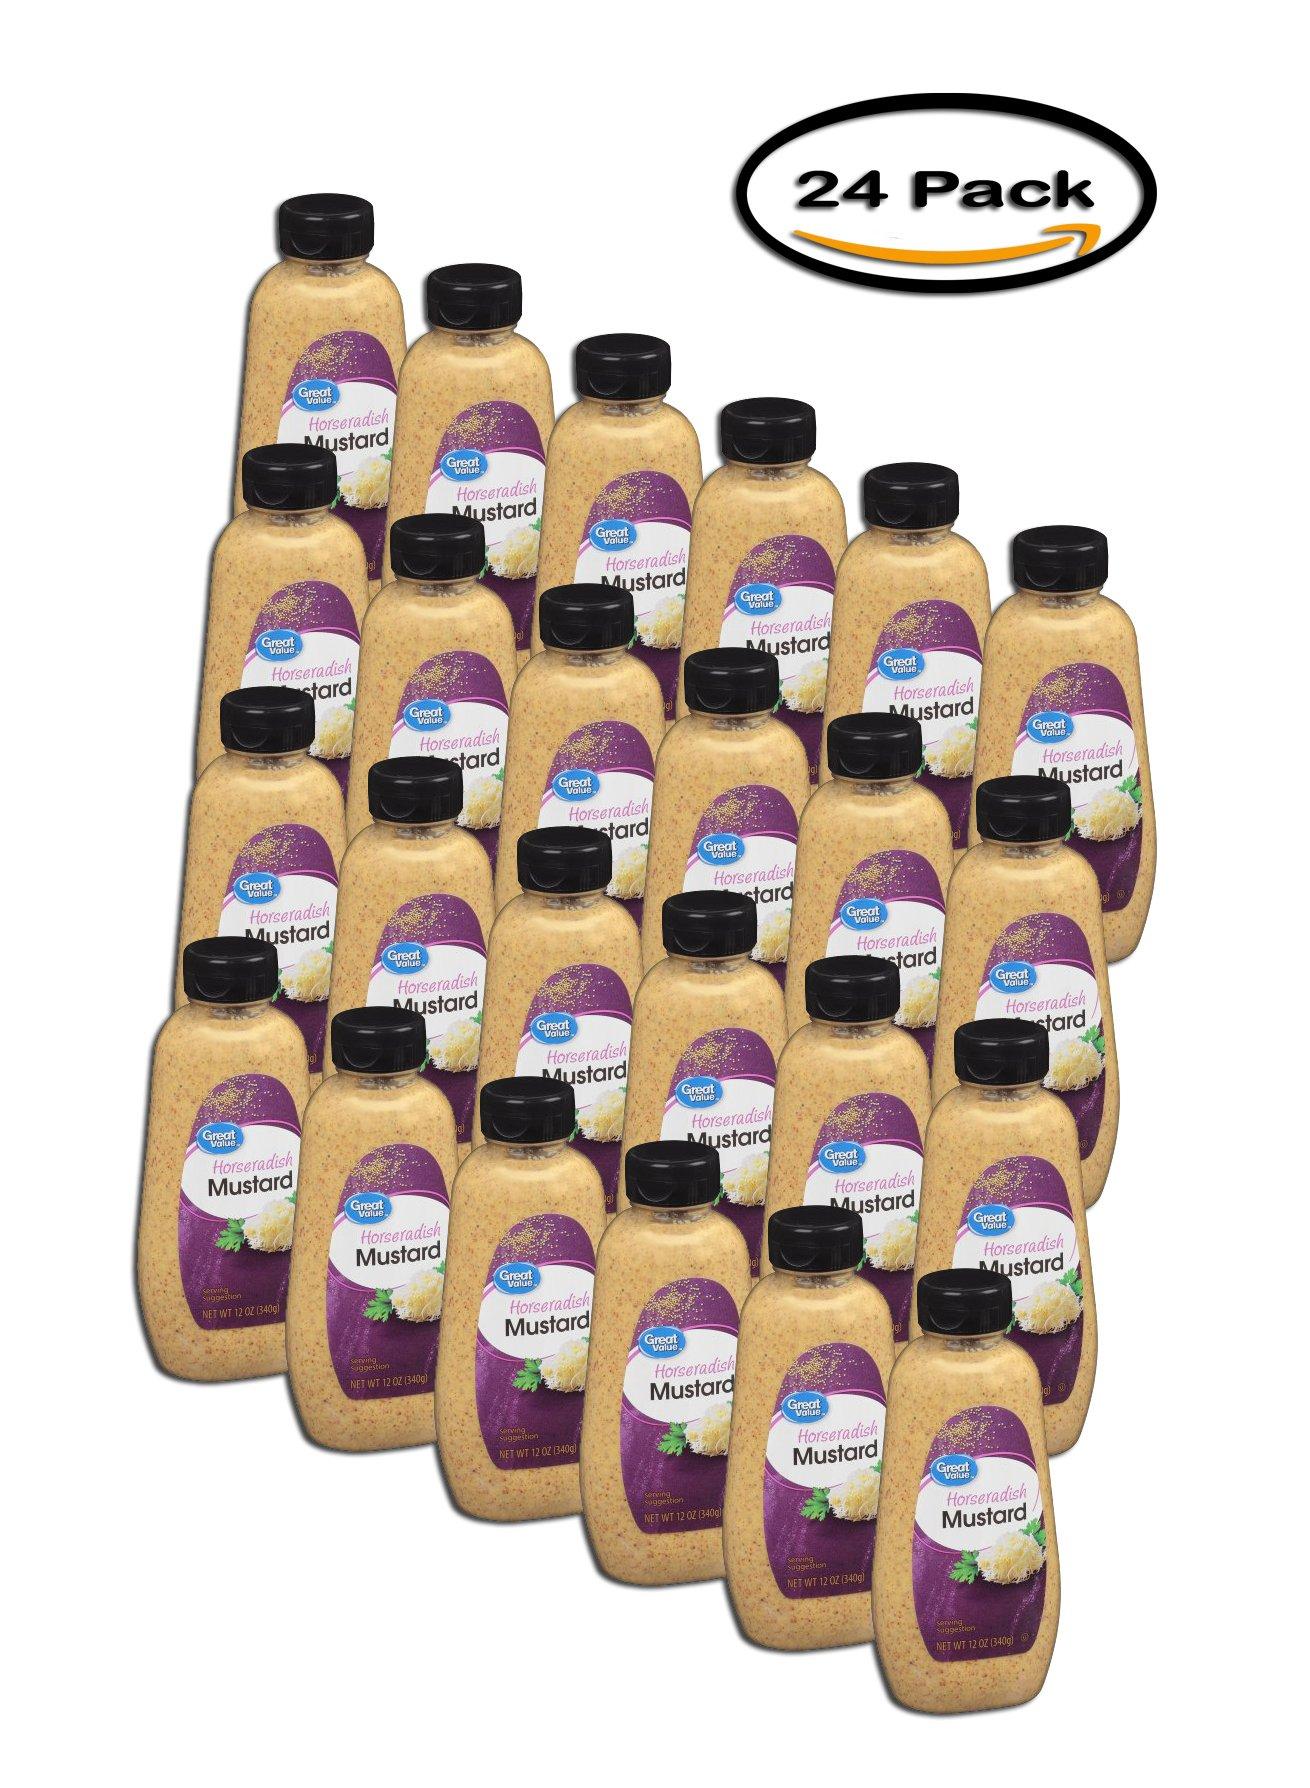 PACK OF 24 - Great Value All Natural Horseradish Mustard, 12 oz